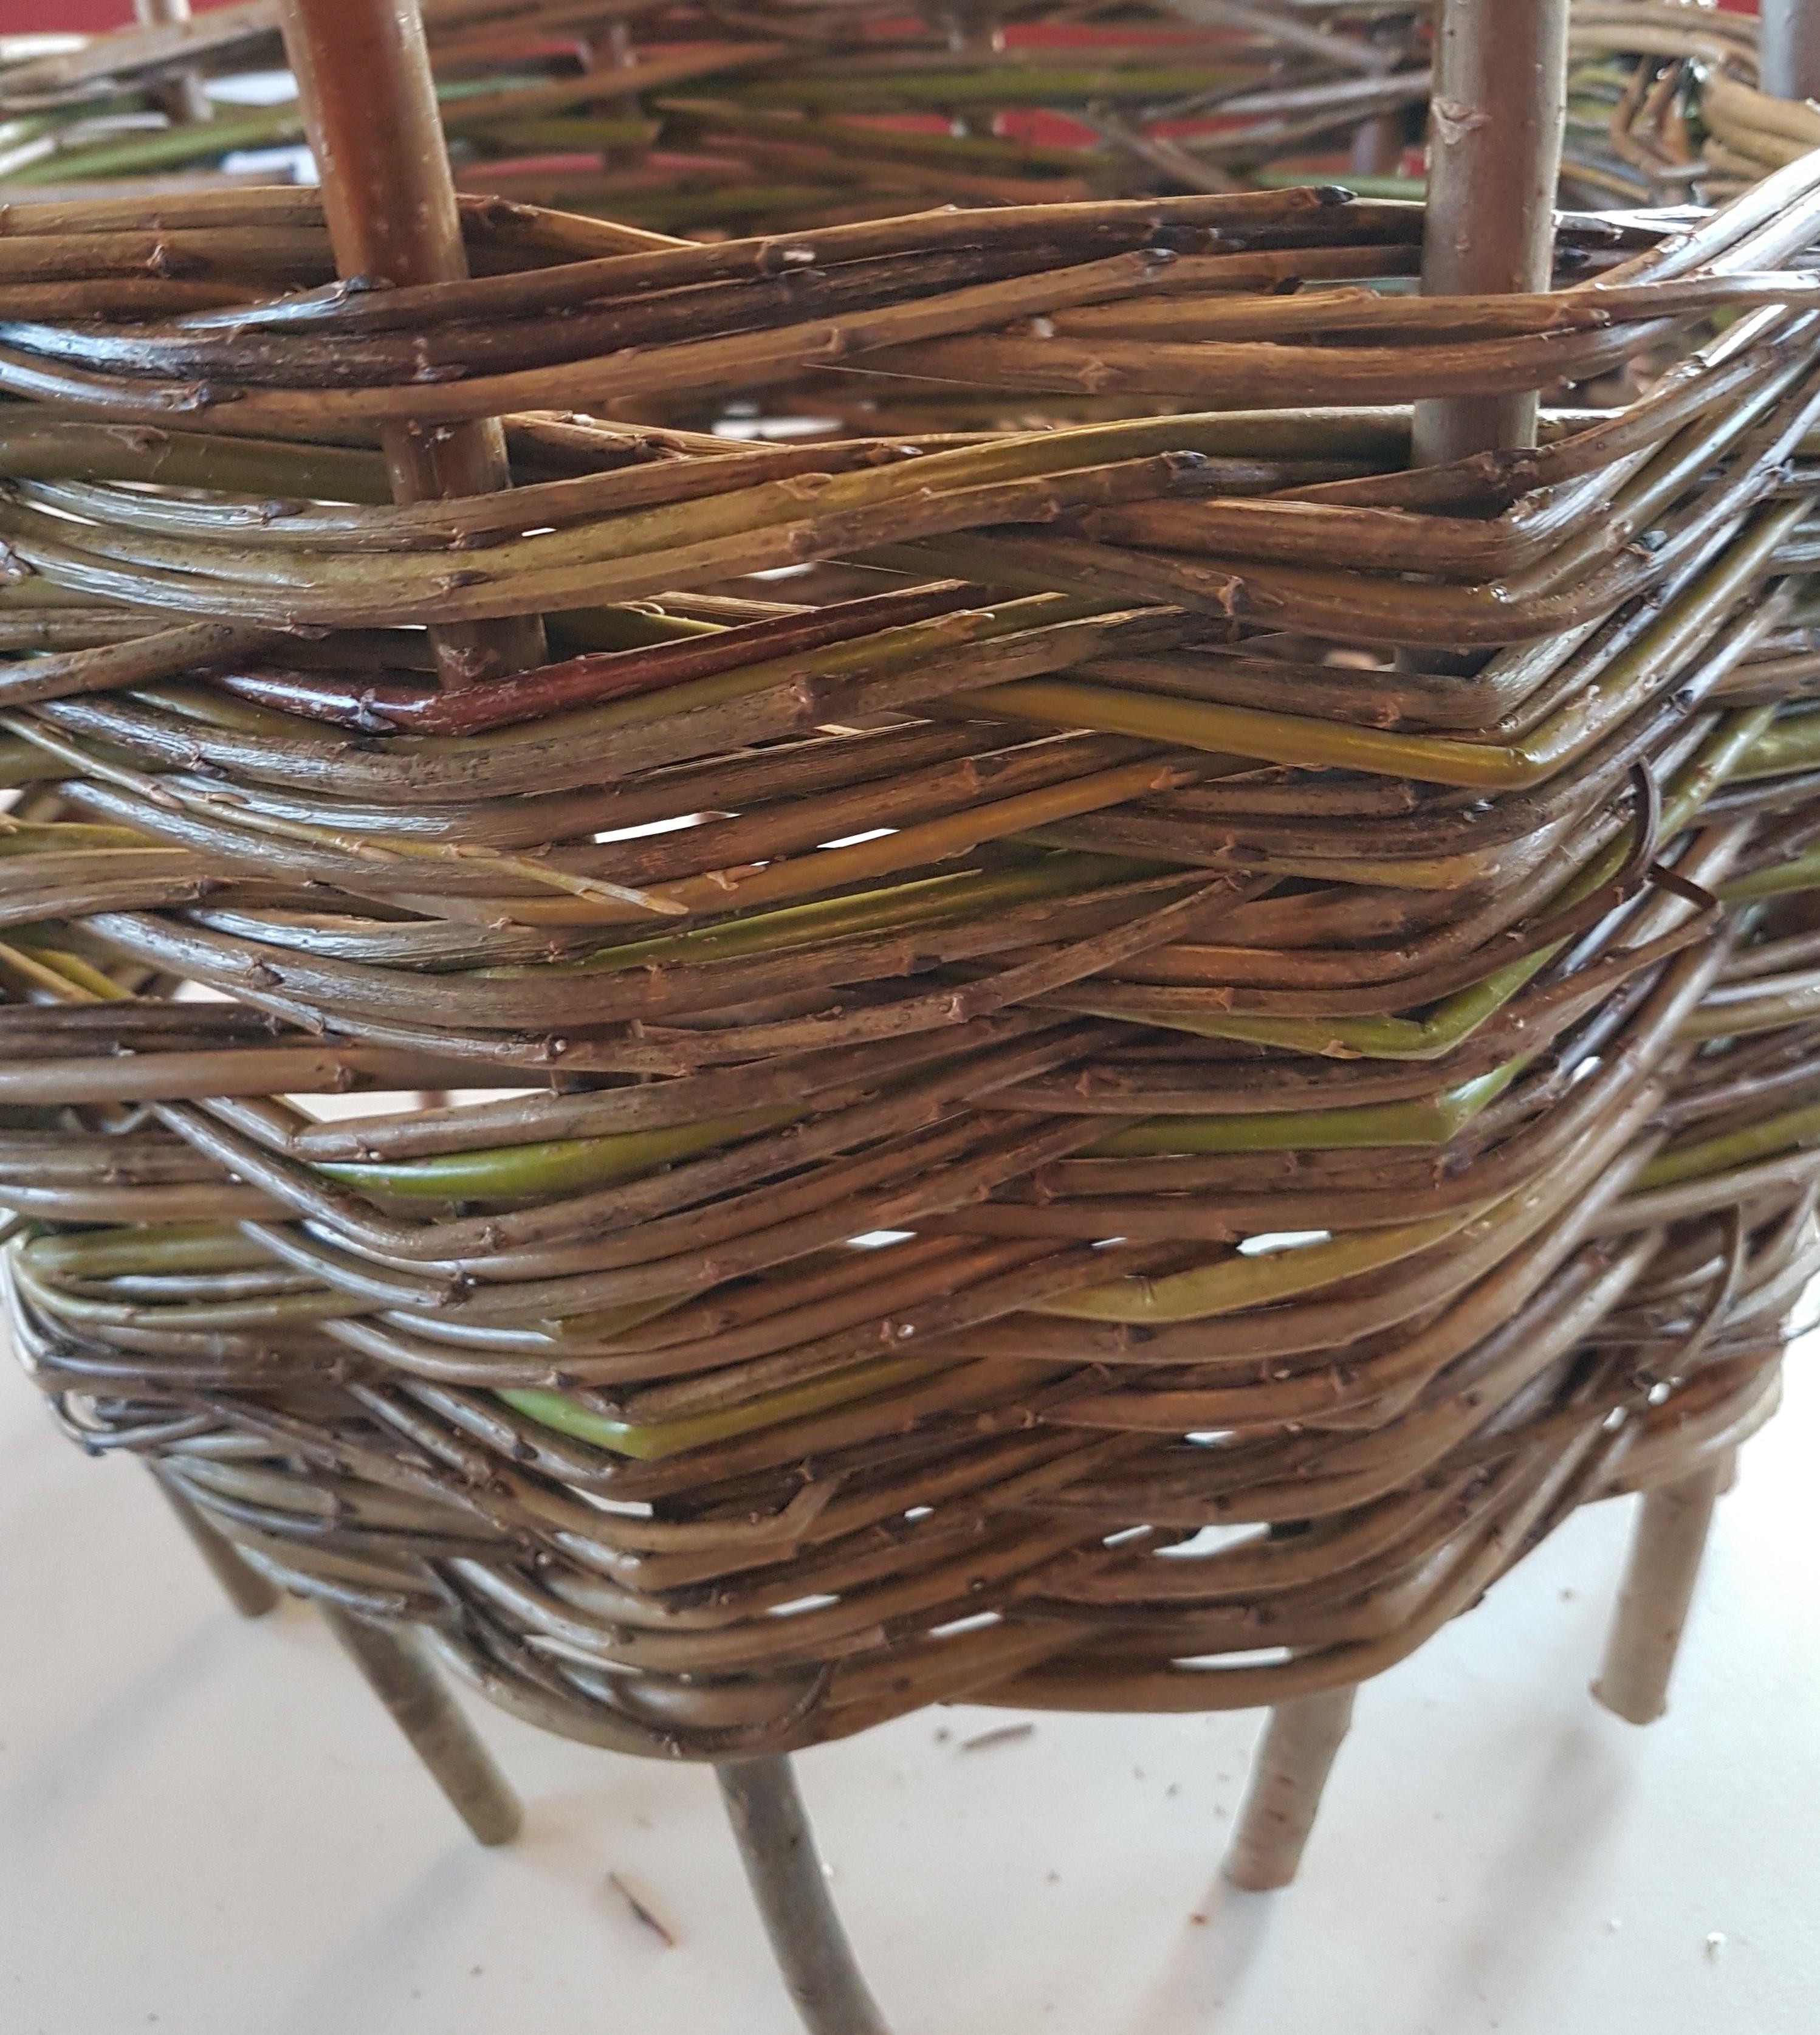 Woven willow Christmas tree skirt or collar